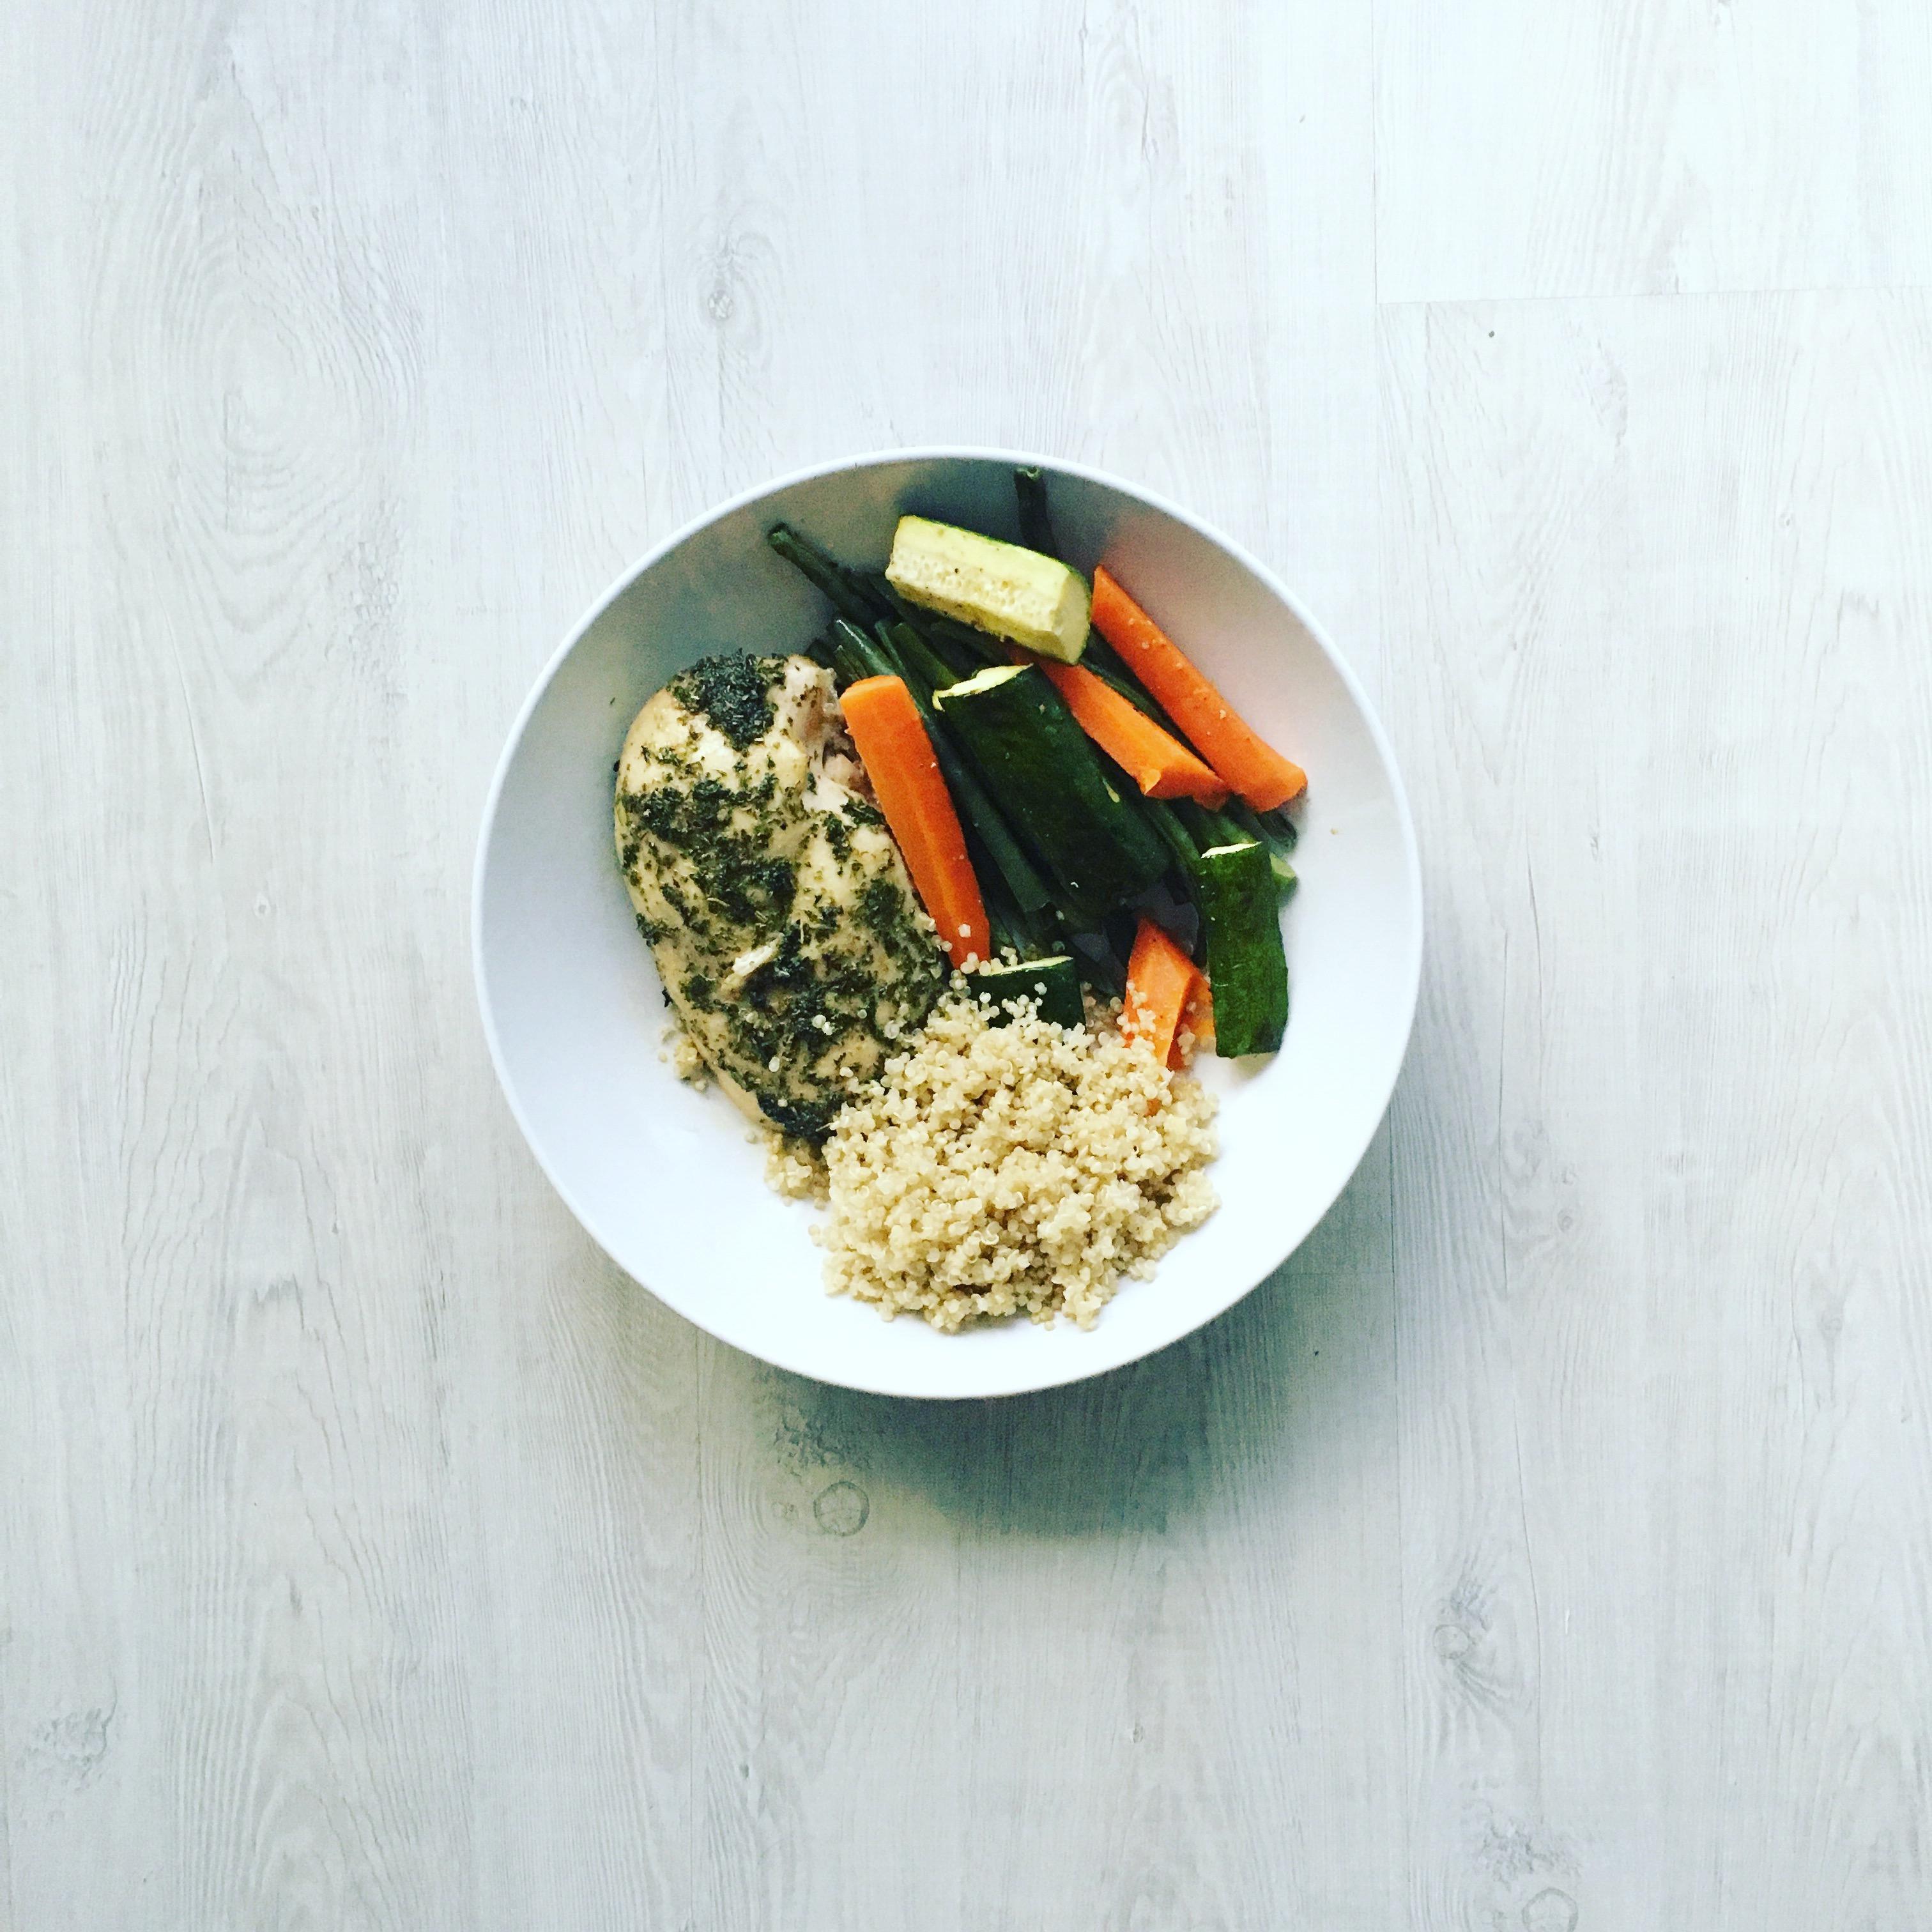 DINNER: Seasoned Chicken Breast with Quinoa and Veggies